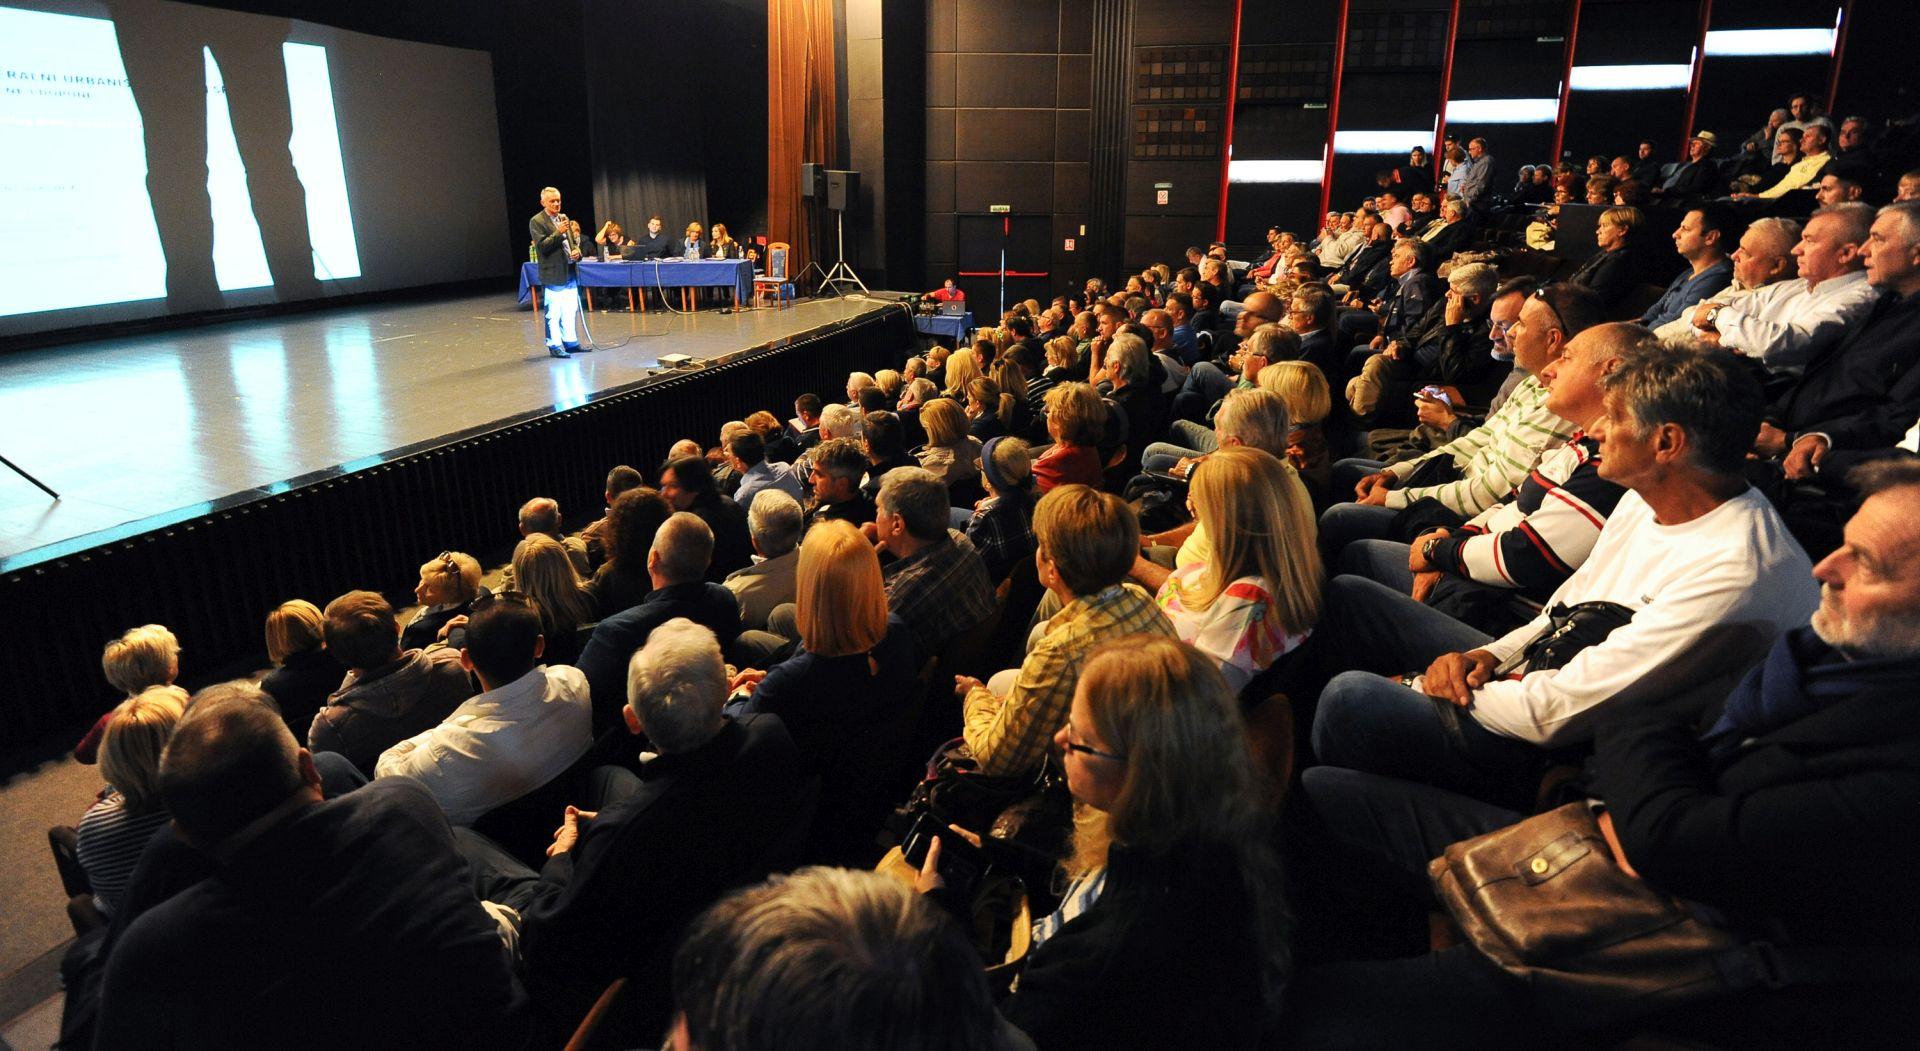 VELIKO ZANIMANJE GRAĐANA: Počela javna rasprava o splitskome GUP-u